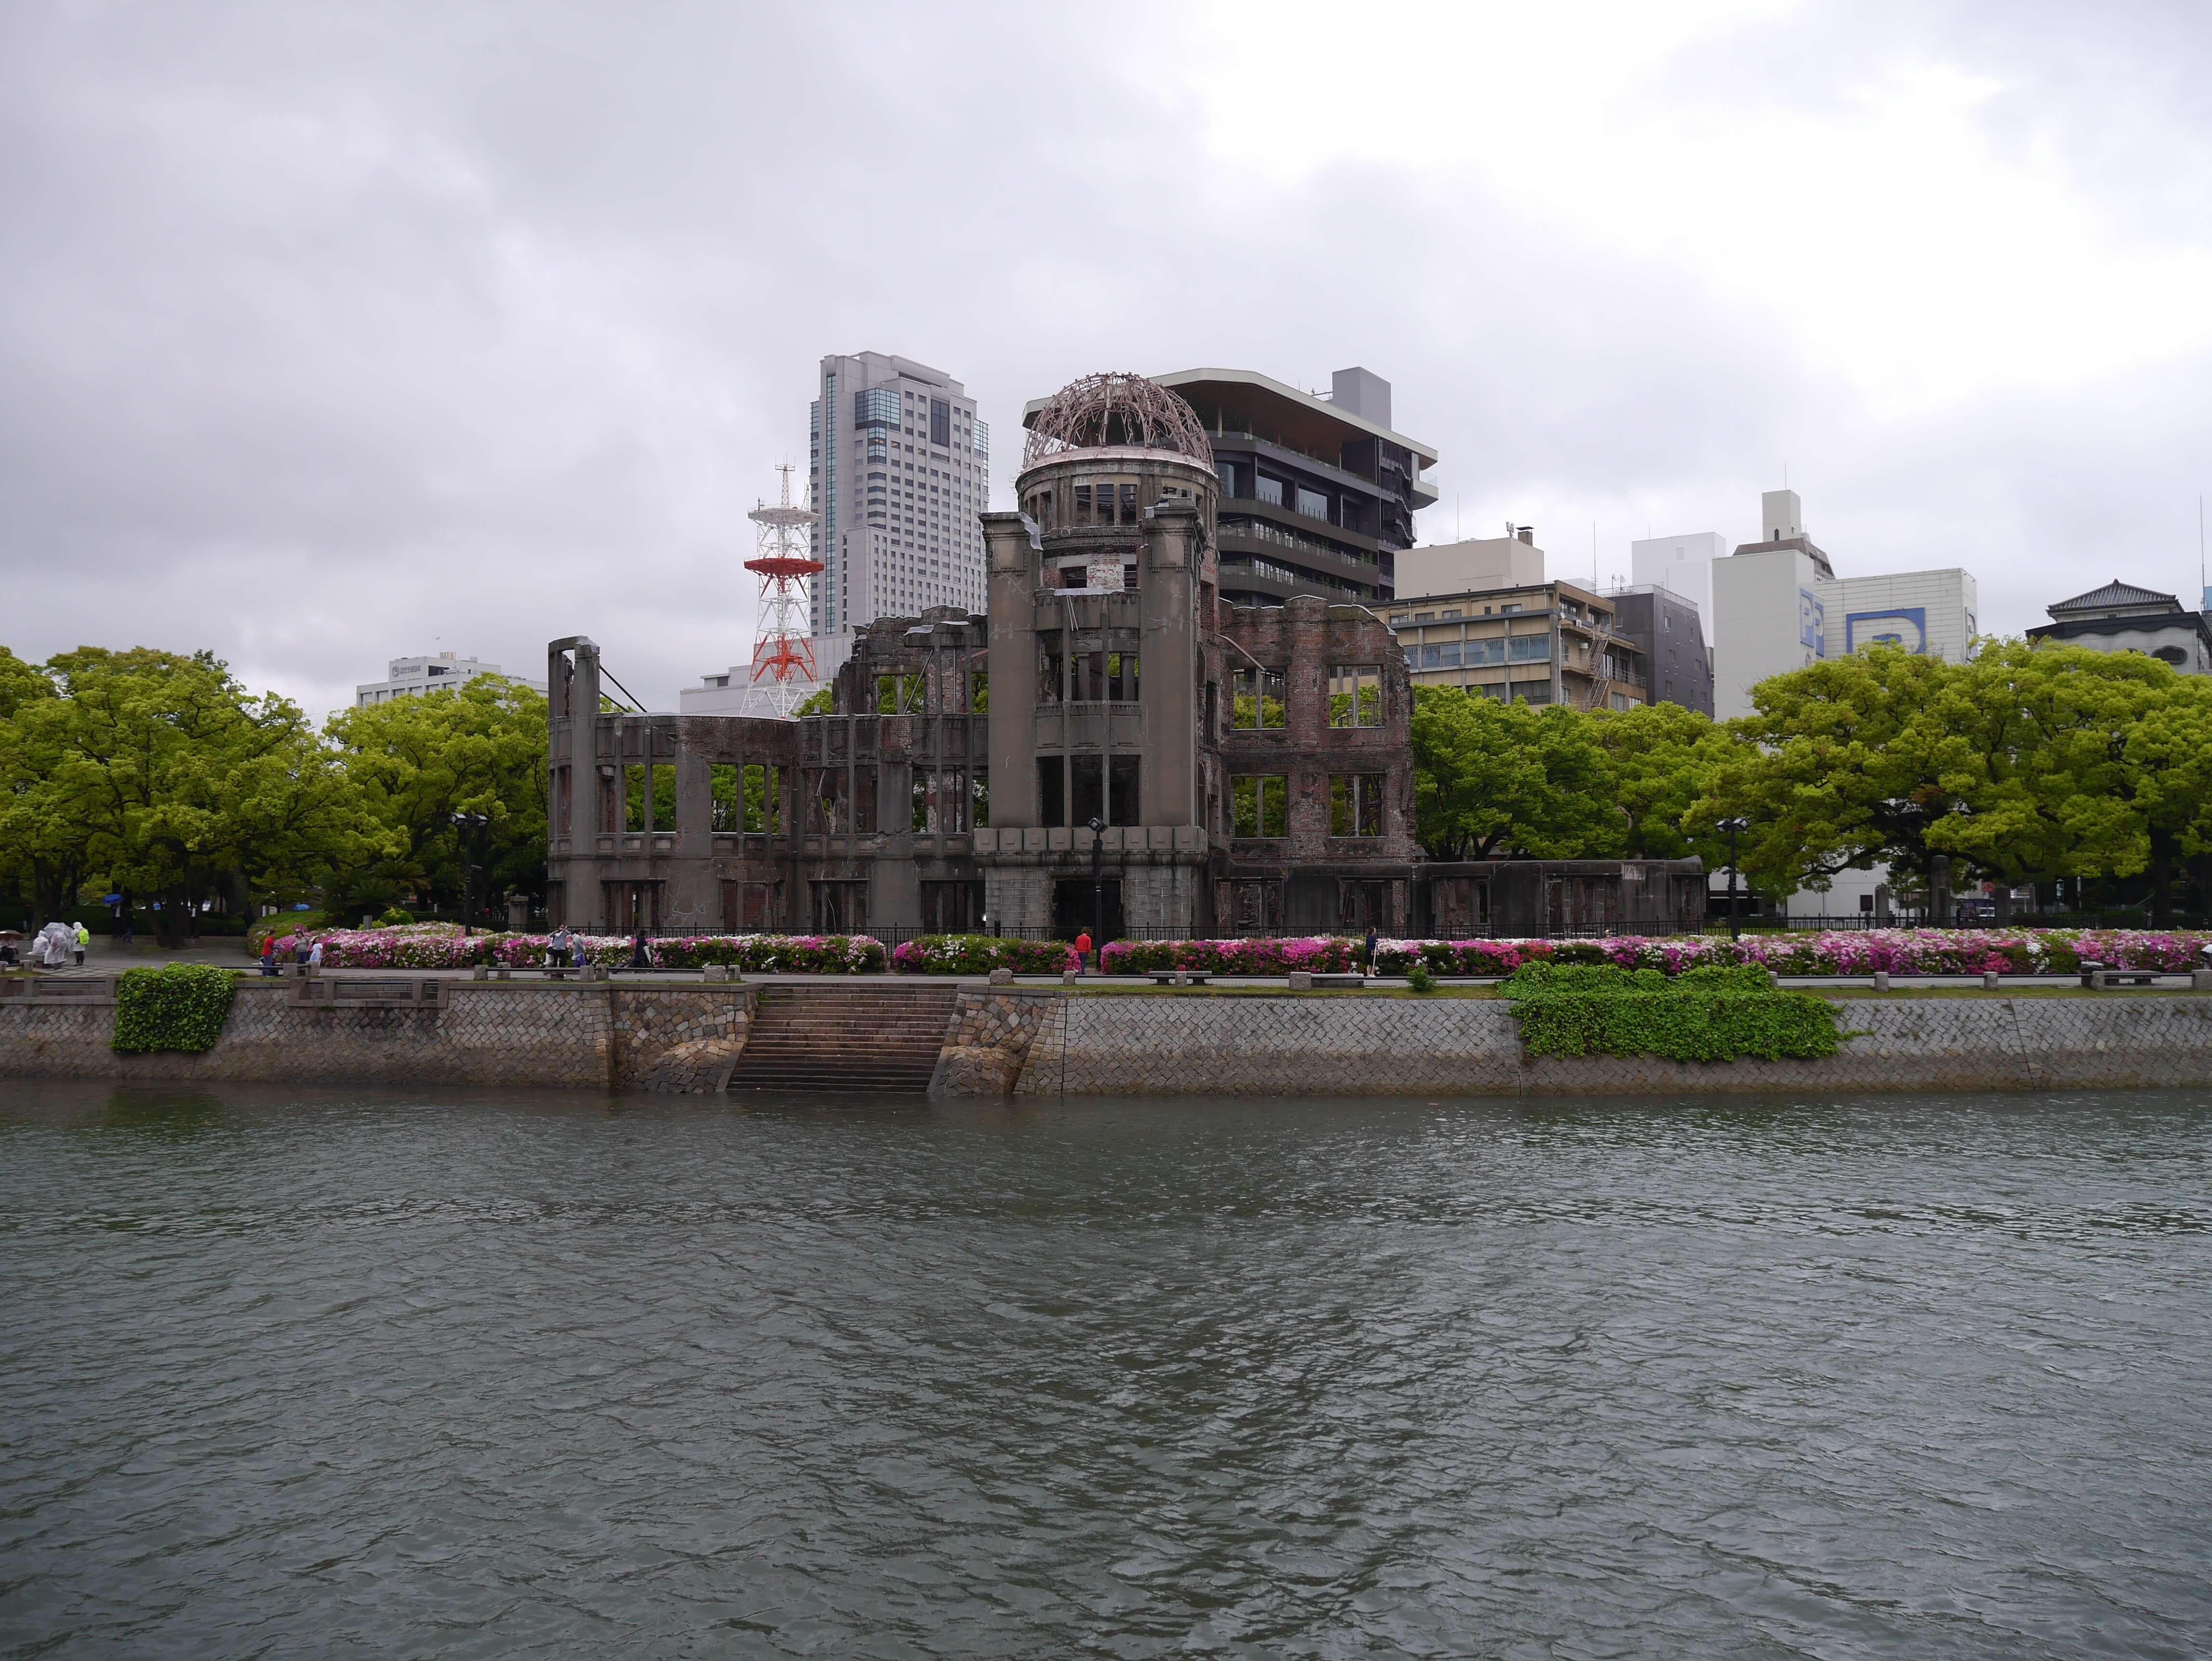 Hiroshima-Japan-river-monument-ruins